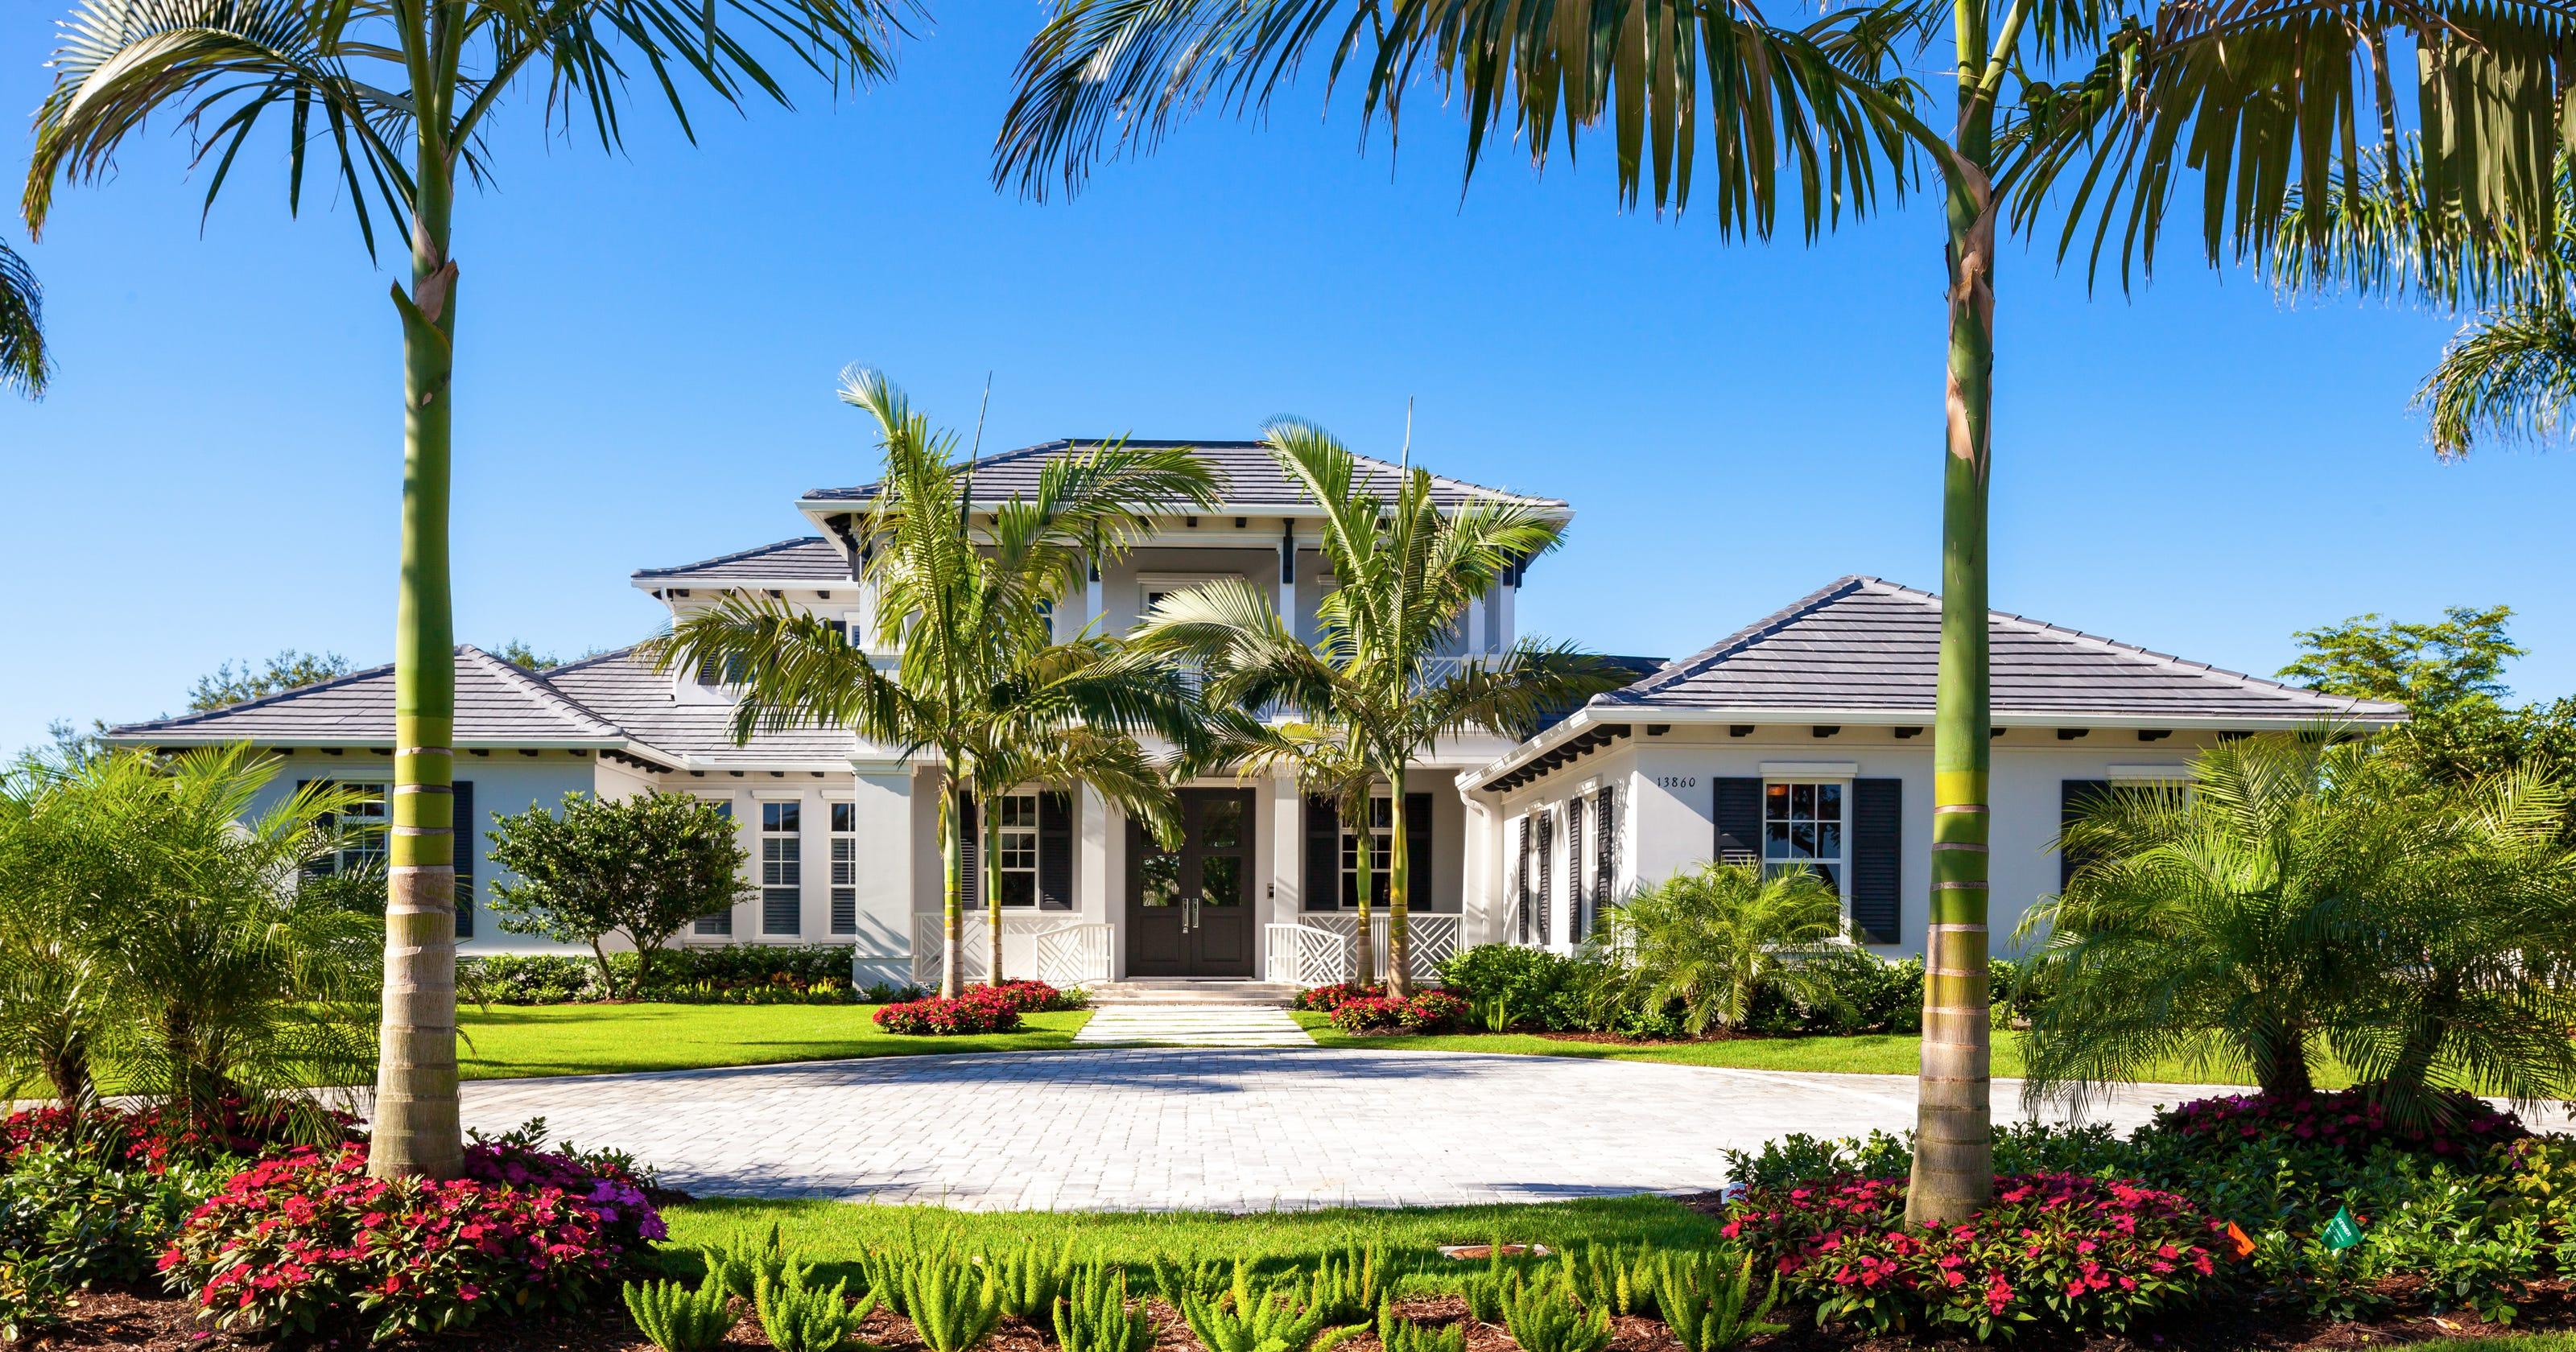 Diamond Custom Homes\' Magnolia model at Quail West sold